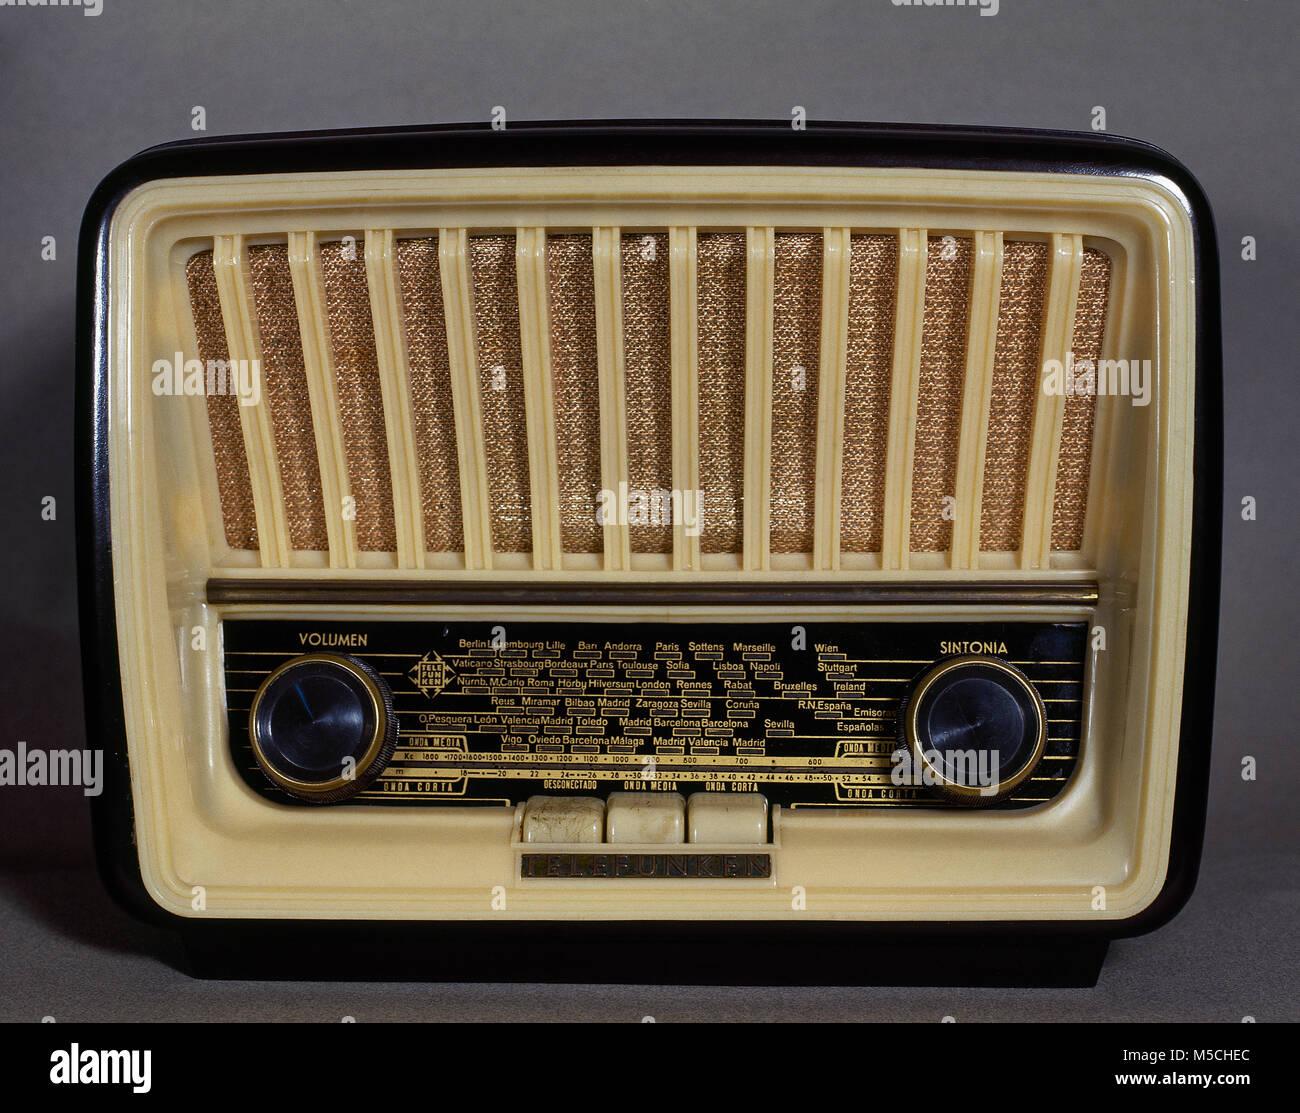 Old radio receiver, Telefunken, model 'Capricho', version U-1815. Medium and short wave. 1958. - Stock Image